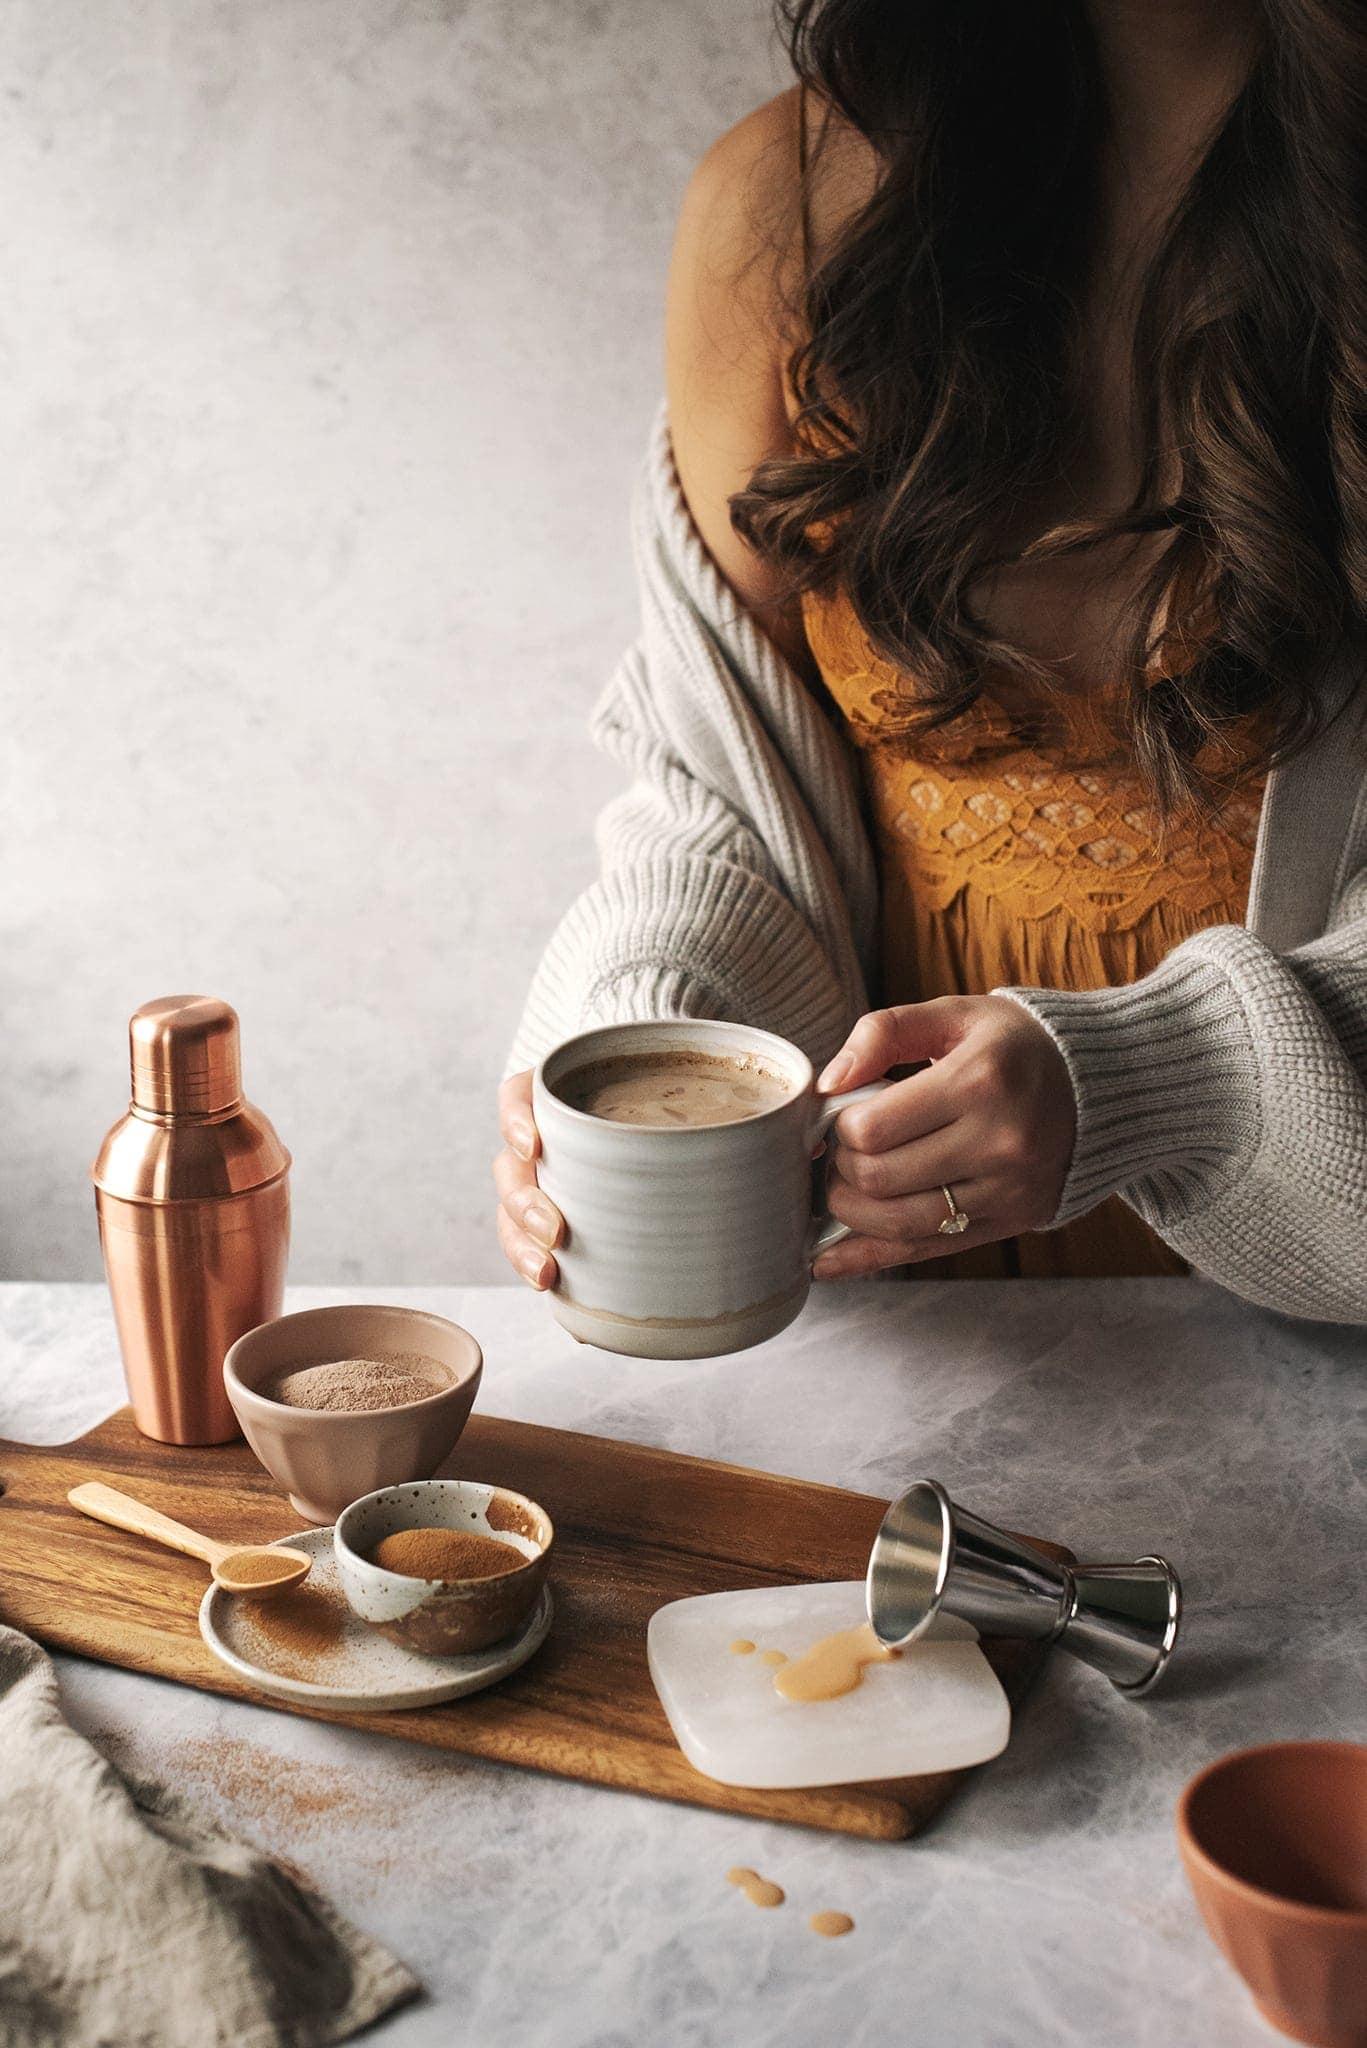 Hands holding a mug of Amarula caffè mocha